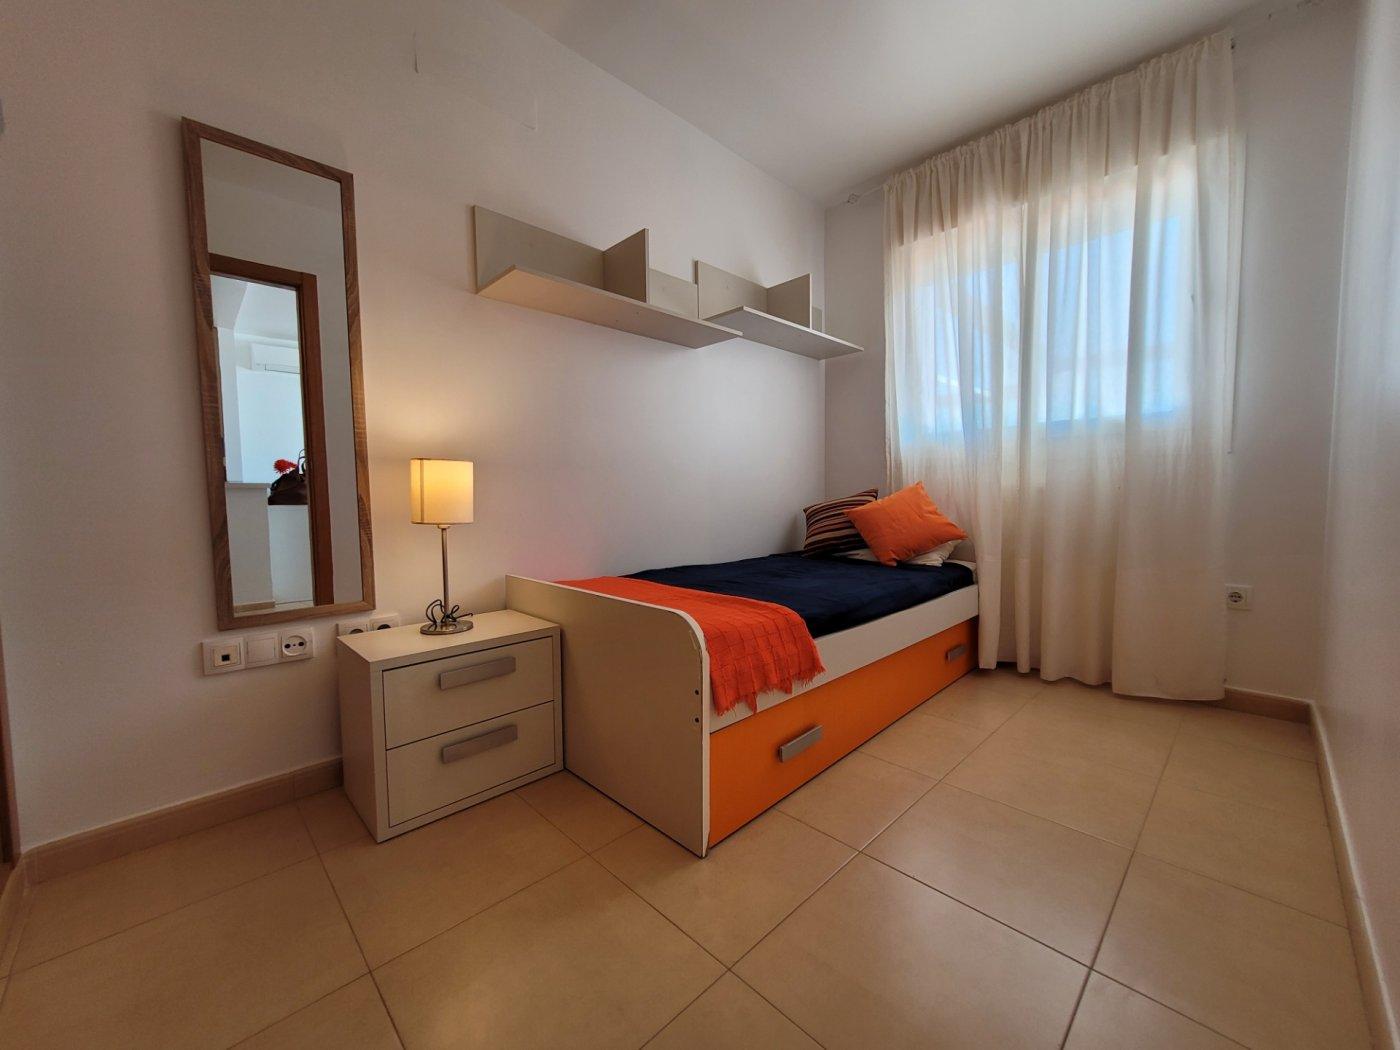 Imagen 5 Piso ref 3523 para rent en Condado De Alhama España - Quality Homes Costa Cálida